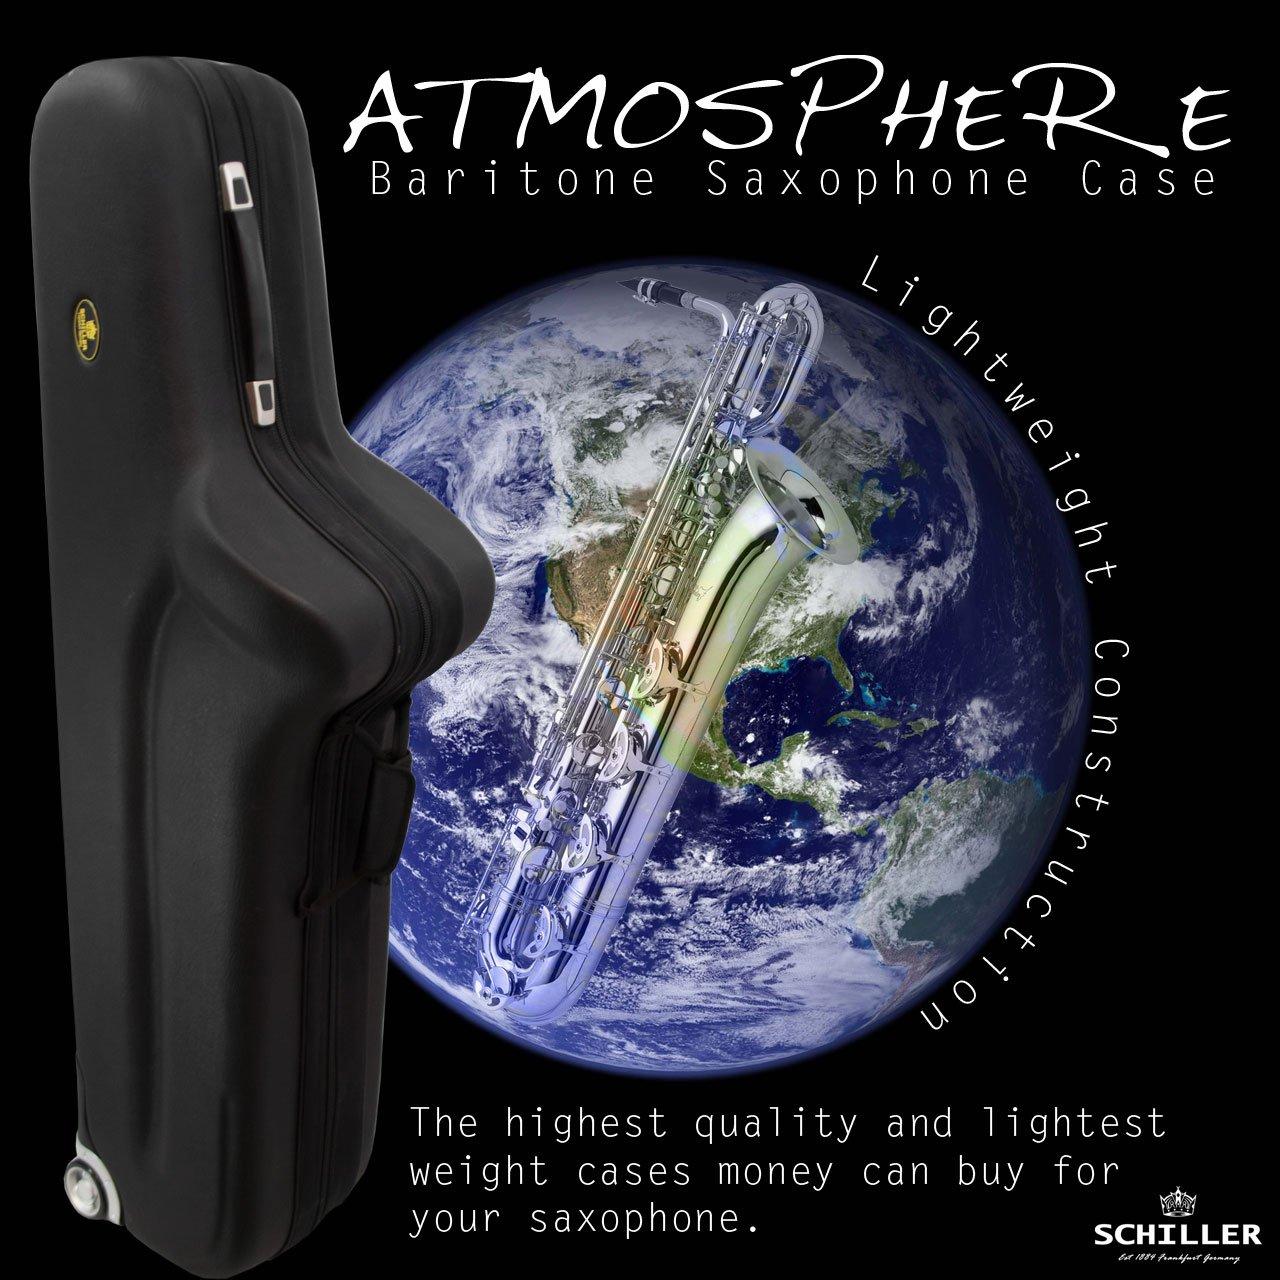 Schiller Atmosphere Baritone Saxophone Case